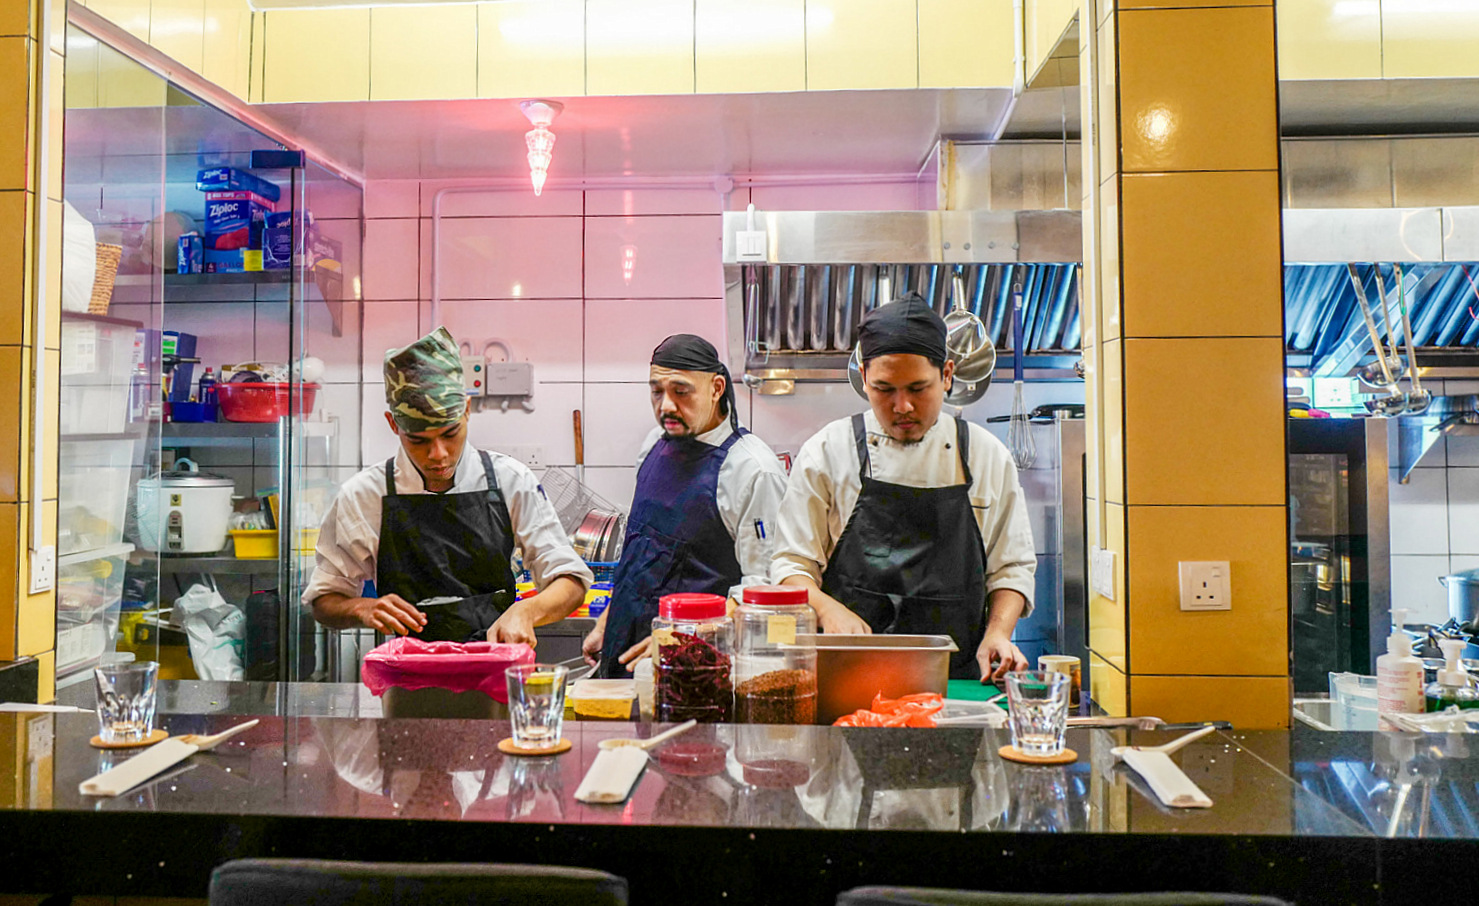 Zoe Bangsar: Eating or Dining? Independent restaurants walk lethal tightrope